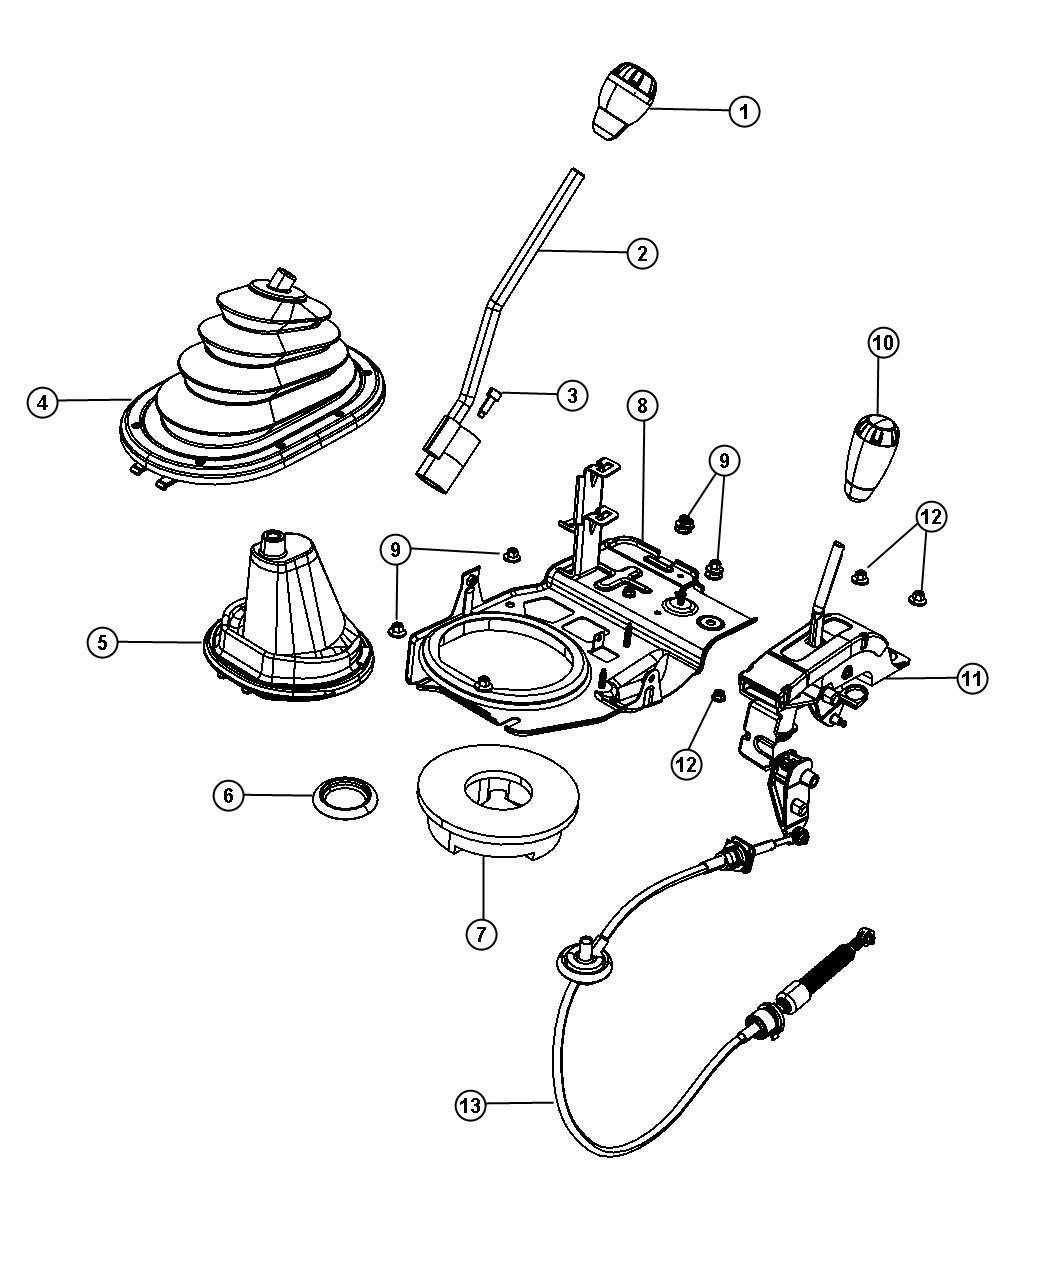 Jeep Wrangler Knob Gearshift Manual Gear Shift Control